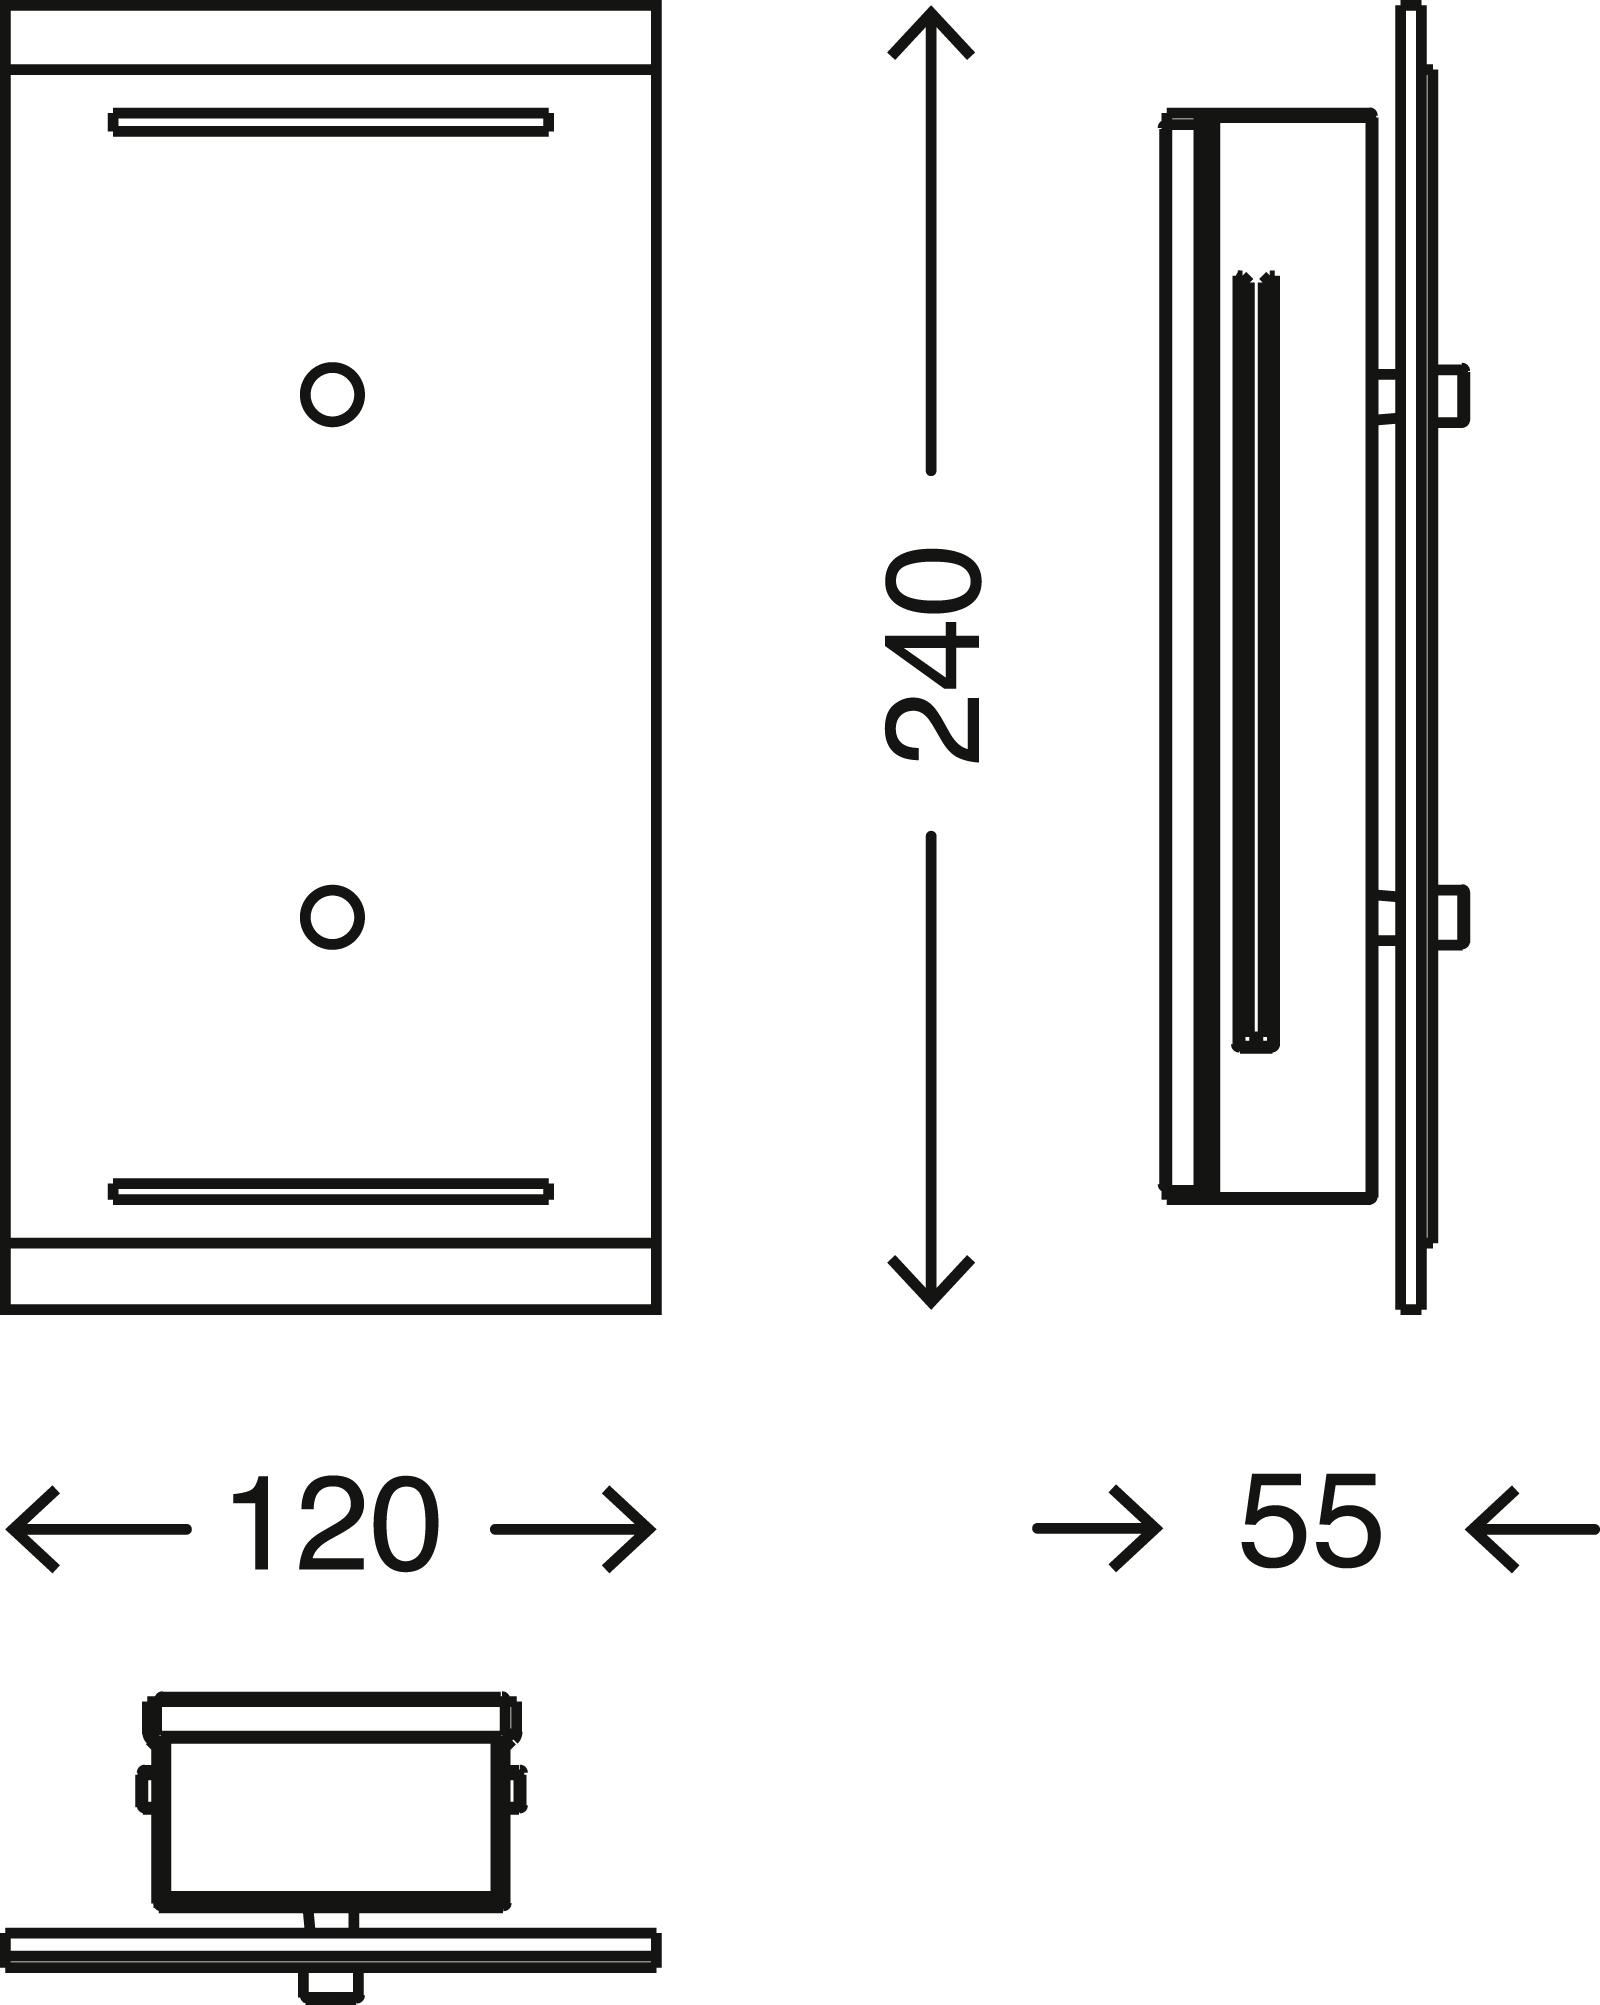 TELEFUNKEN LED Aussenleuchte, 24 cm, 7,5 W, Weiss